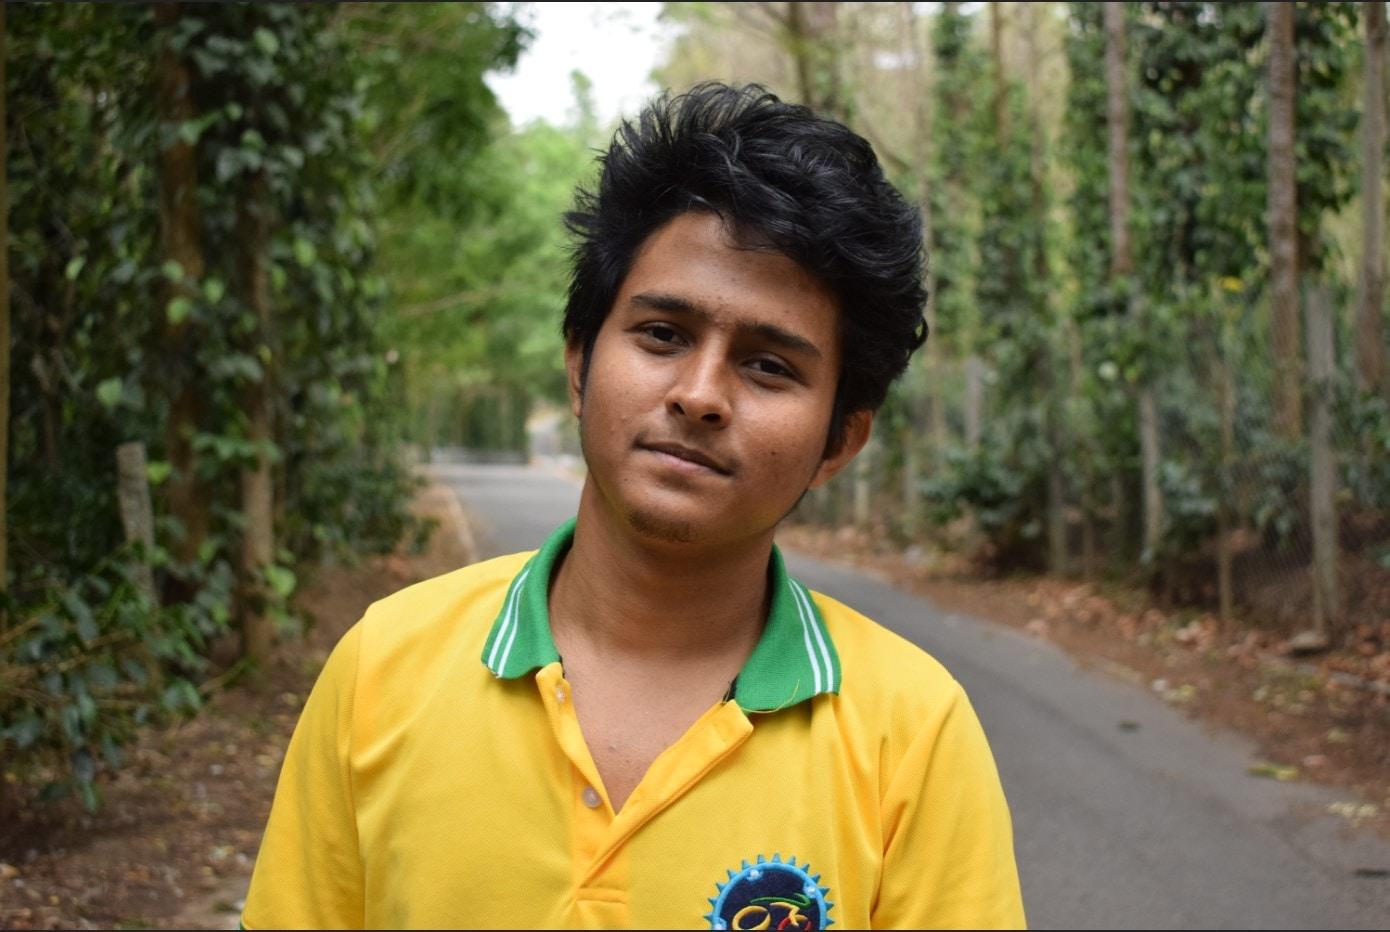 Go to Pranav Madhavan's profile